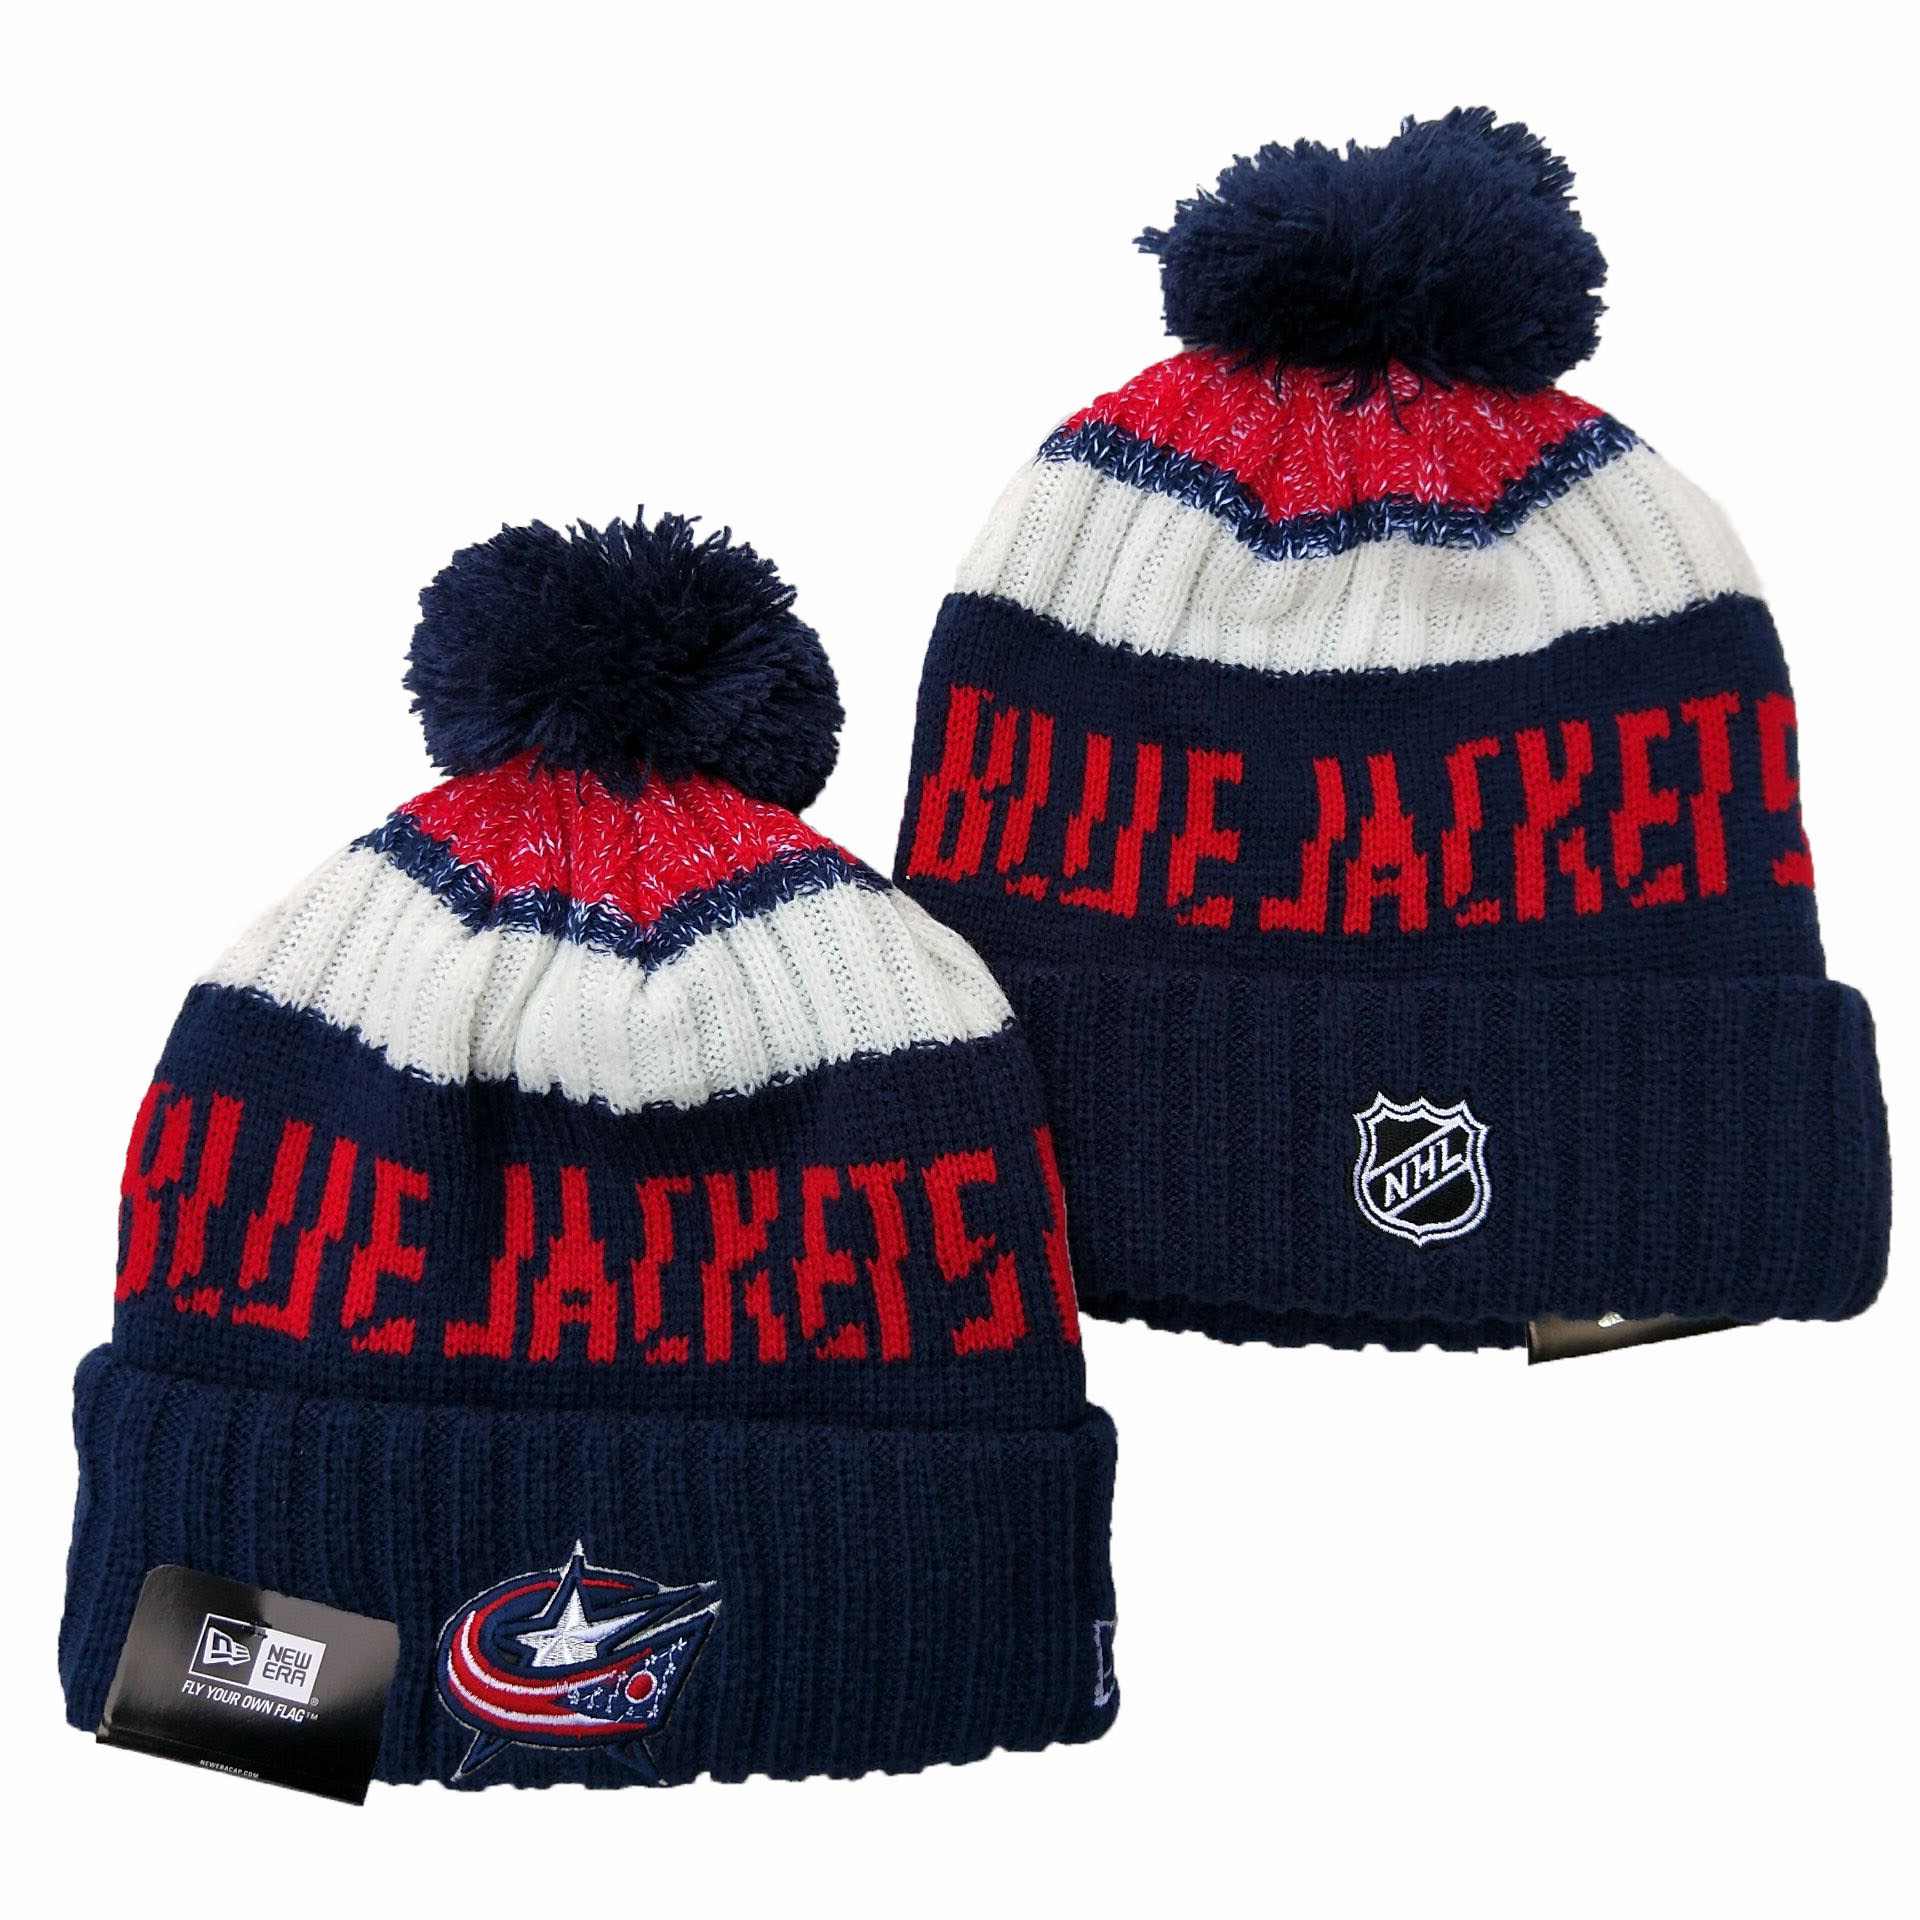 Columbus Blue Jackets Team Logo Black Pom Knit Hat YD